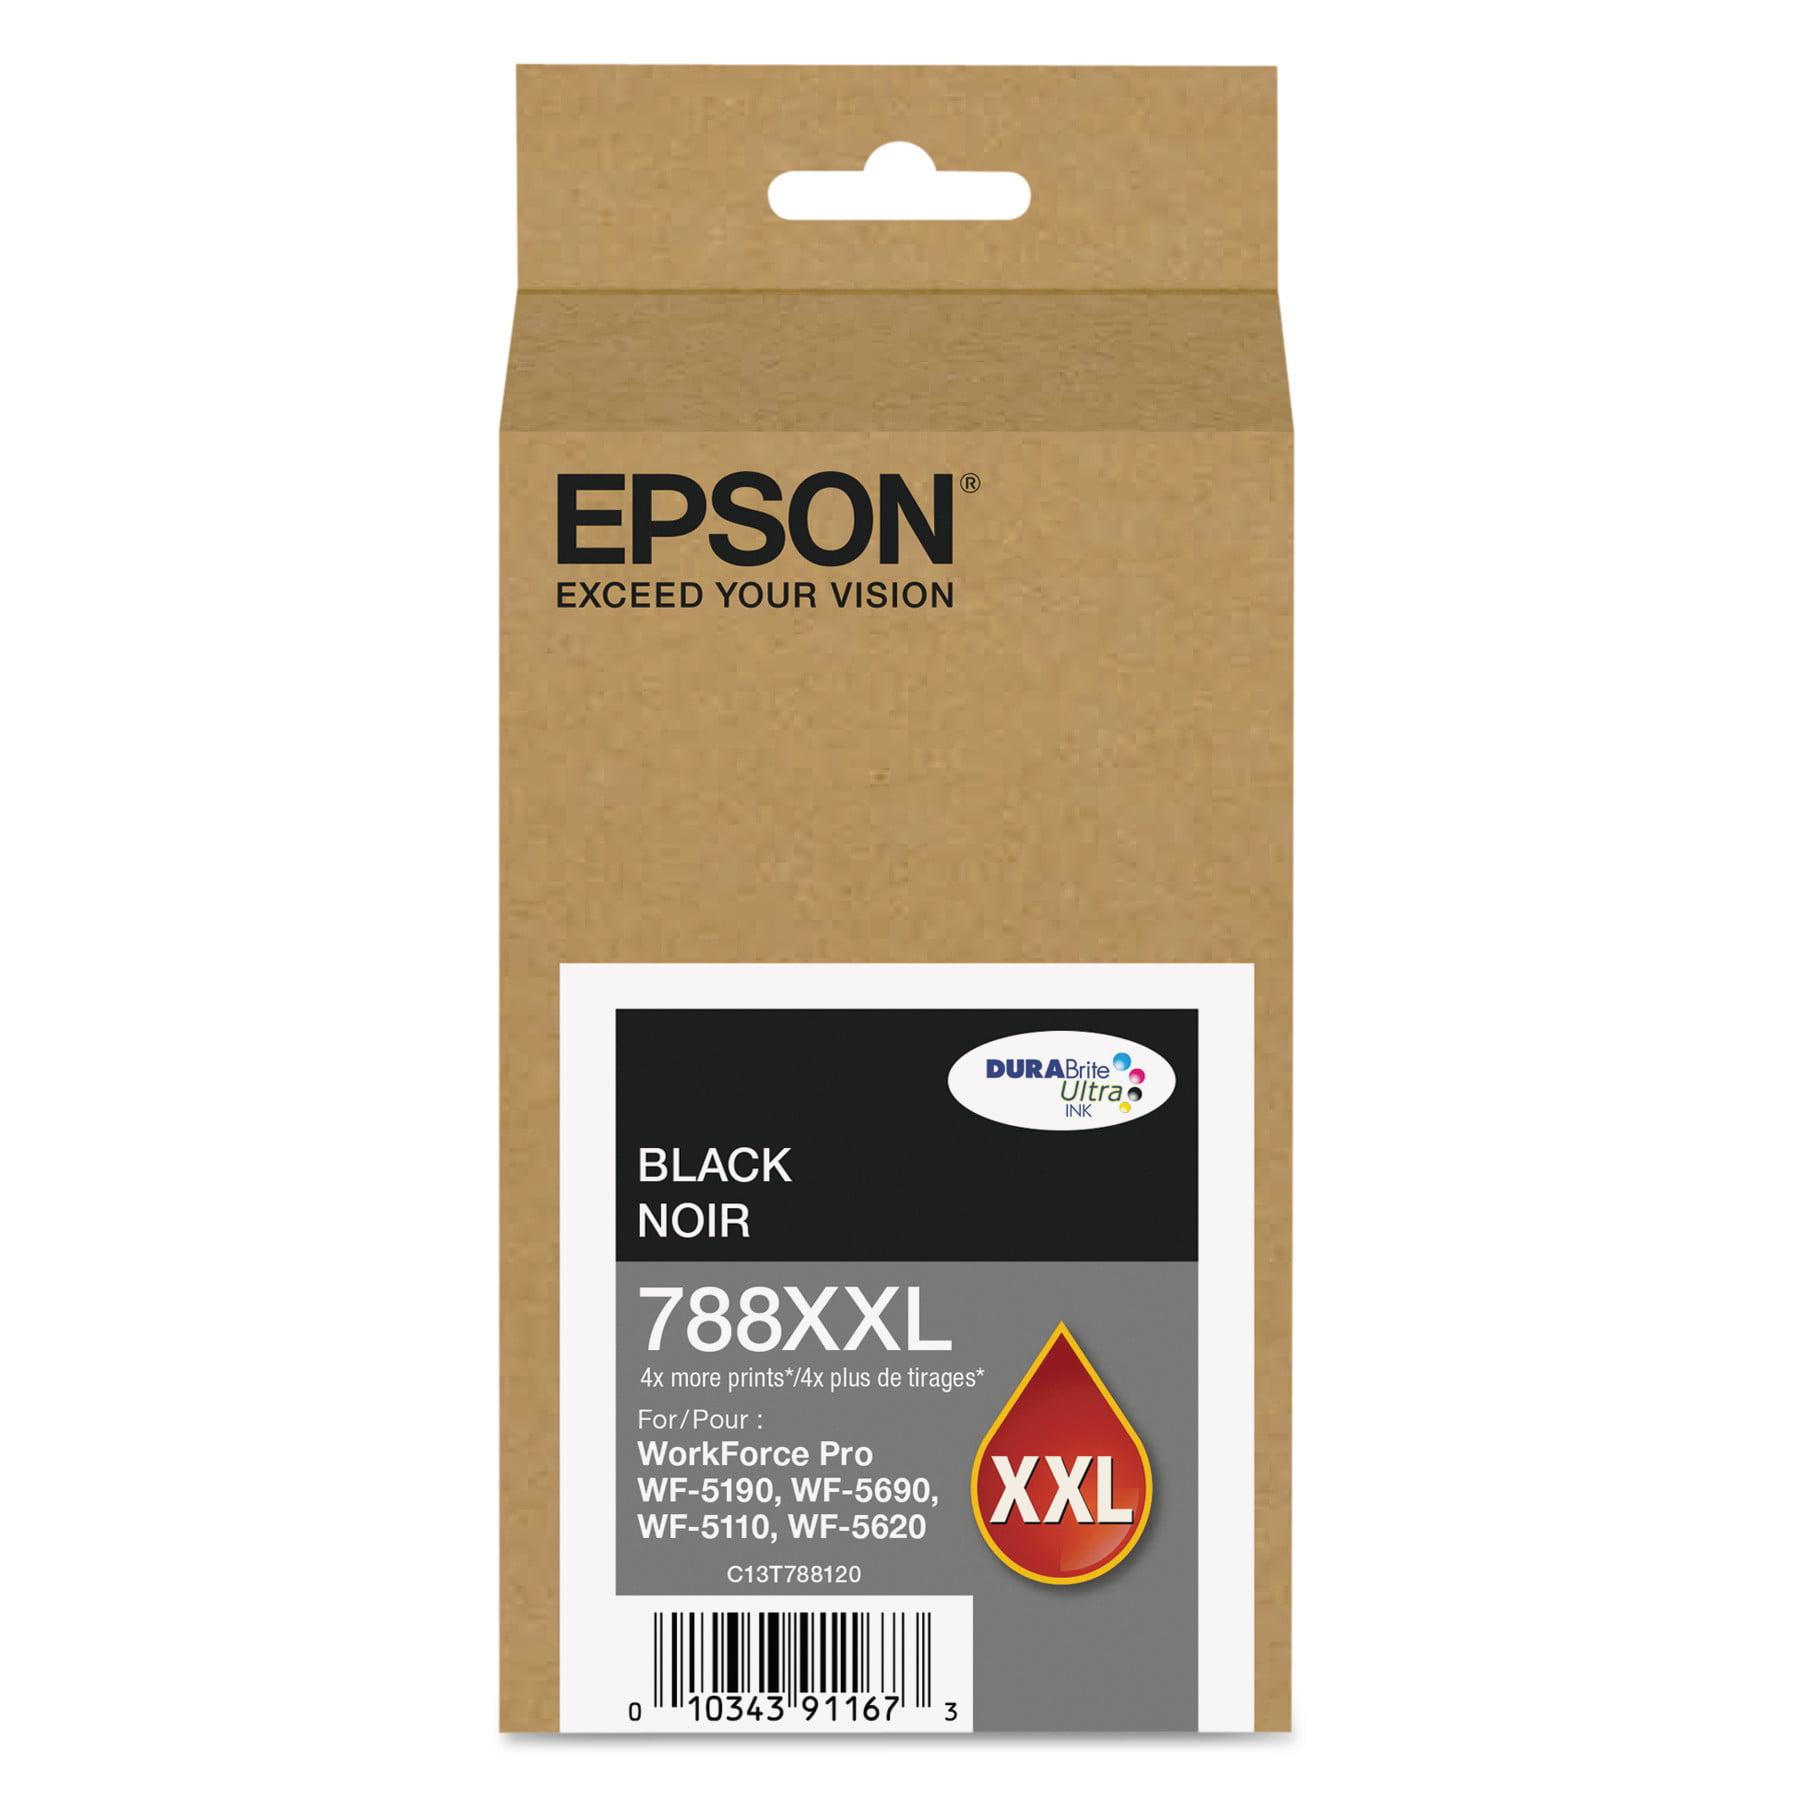 Epson T788XXL120 (788XXL) DURABrite Ultra XL PRO High-Yield Ink, Black by Epson